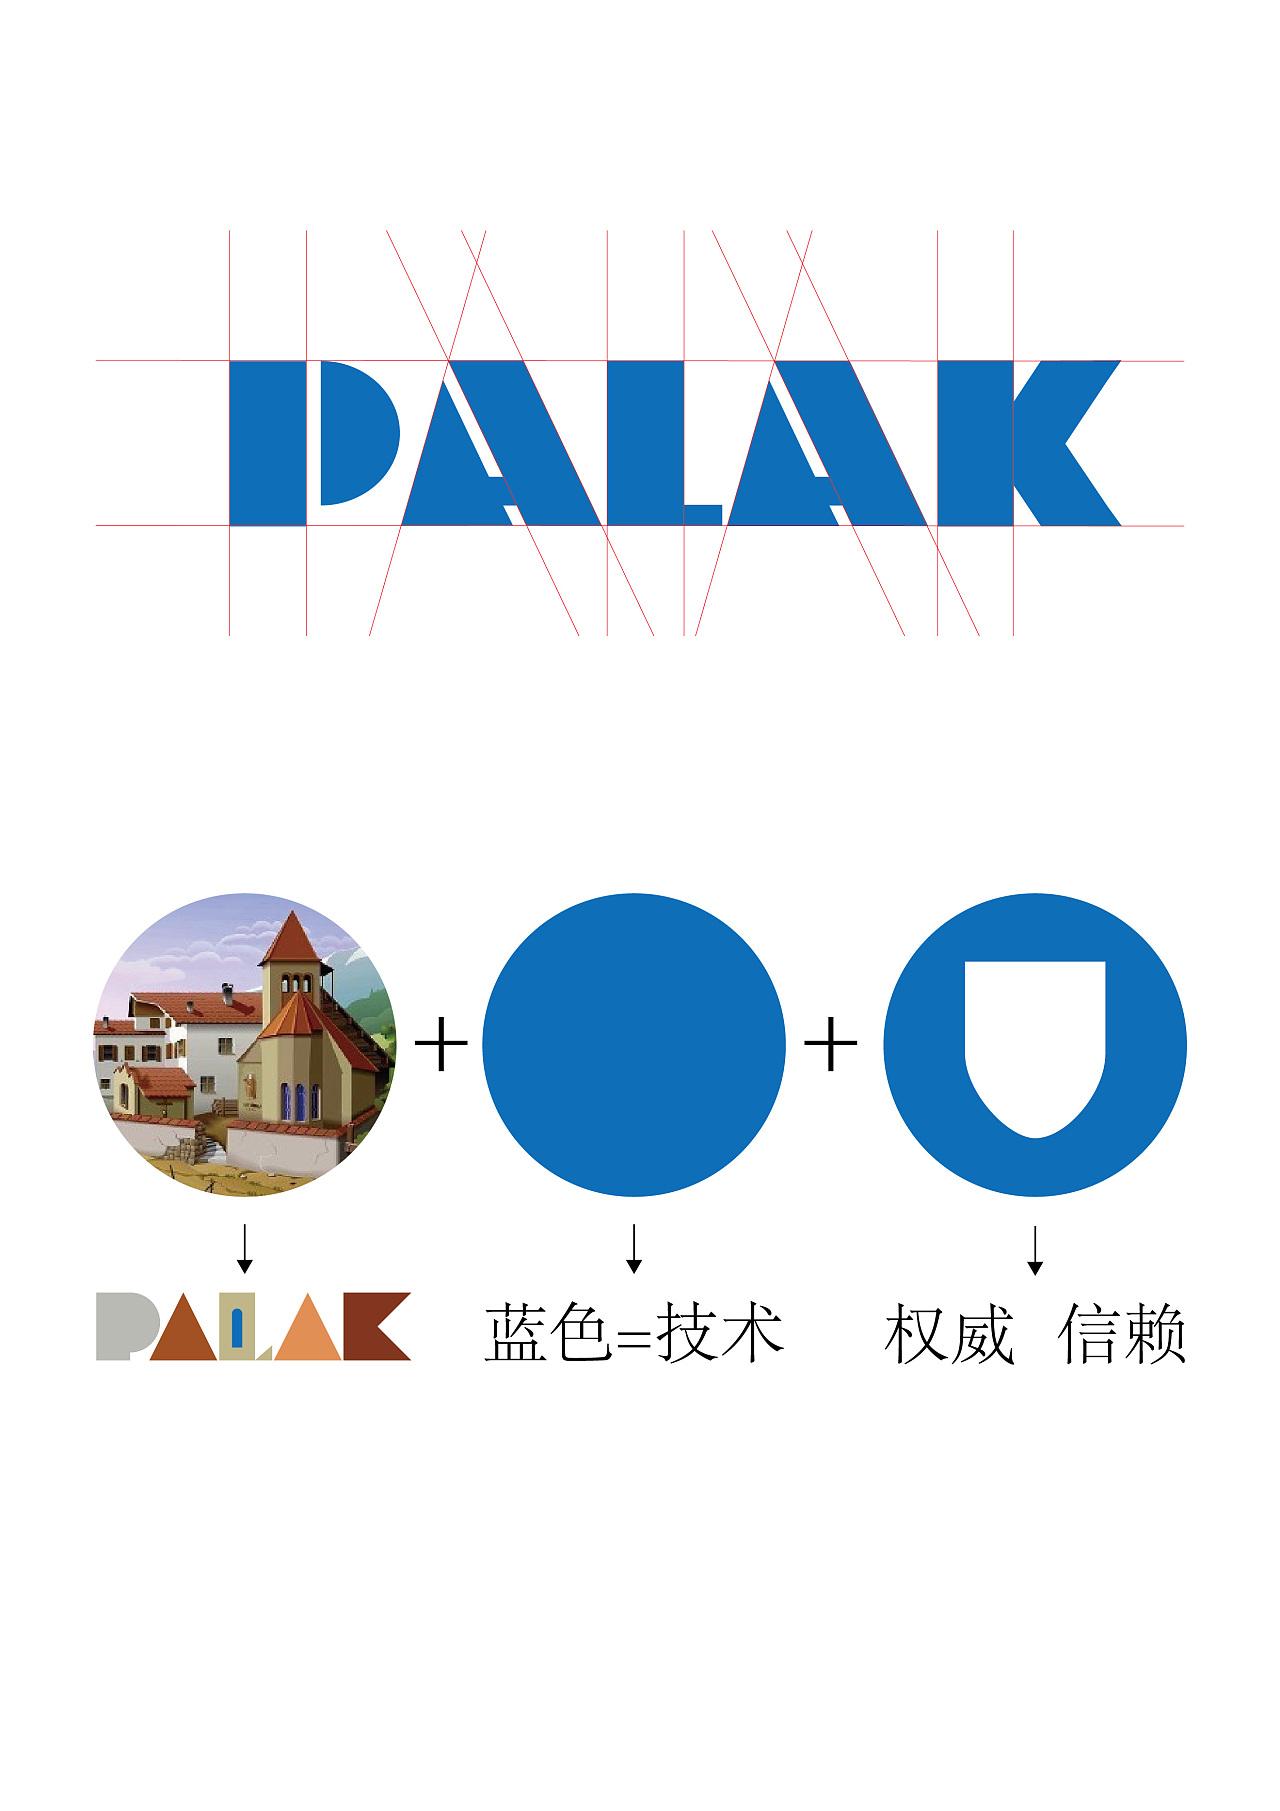 PALAK 帕拉克硅藻泥品牌形象设计